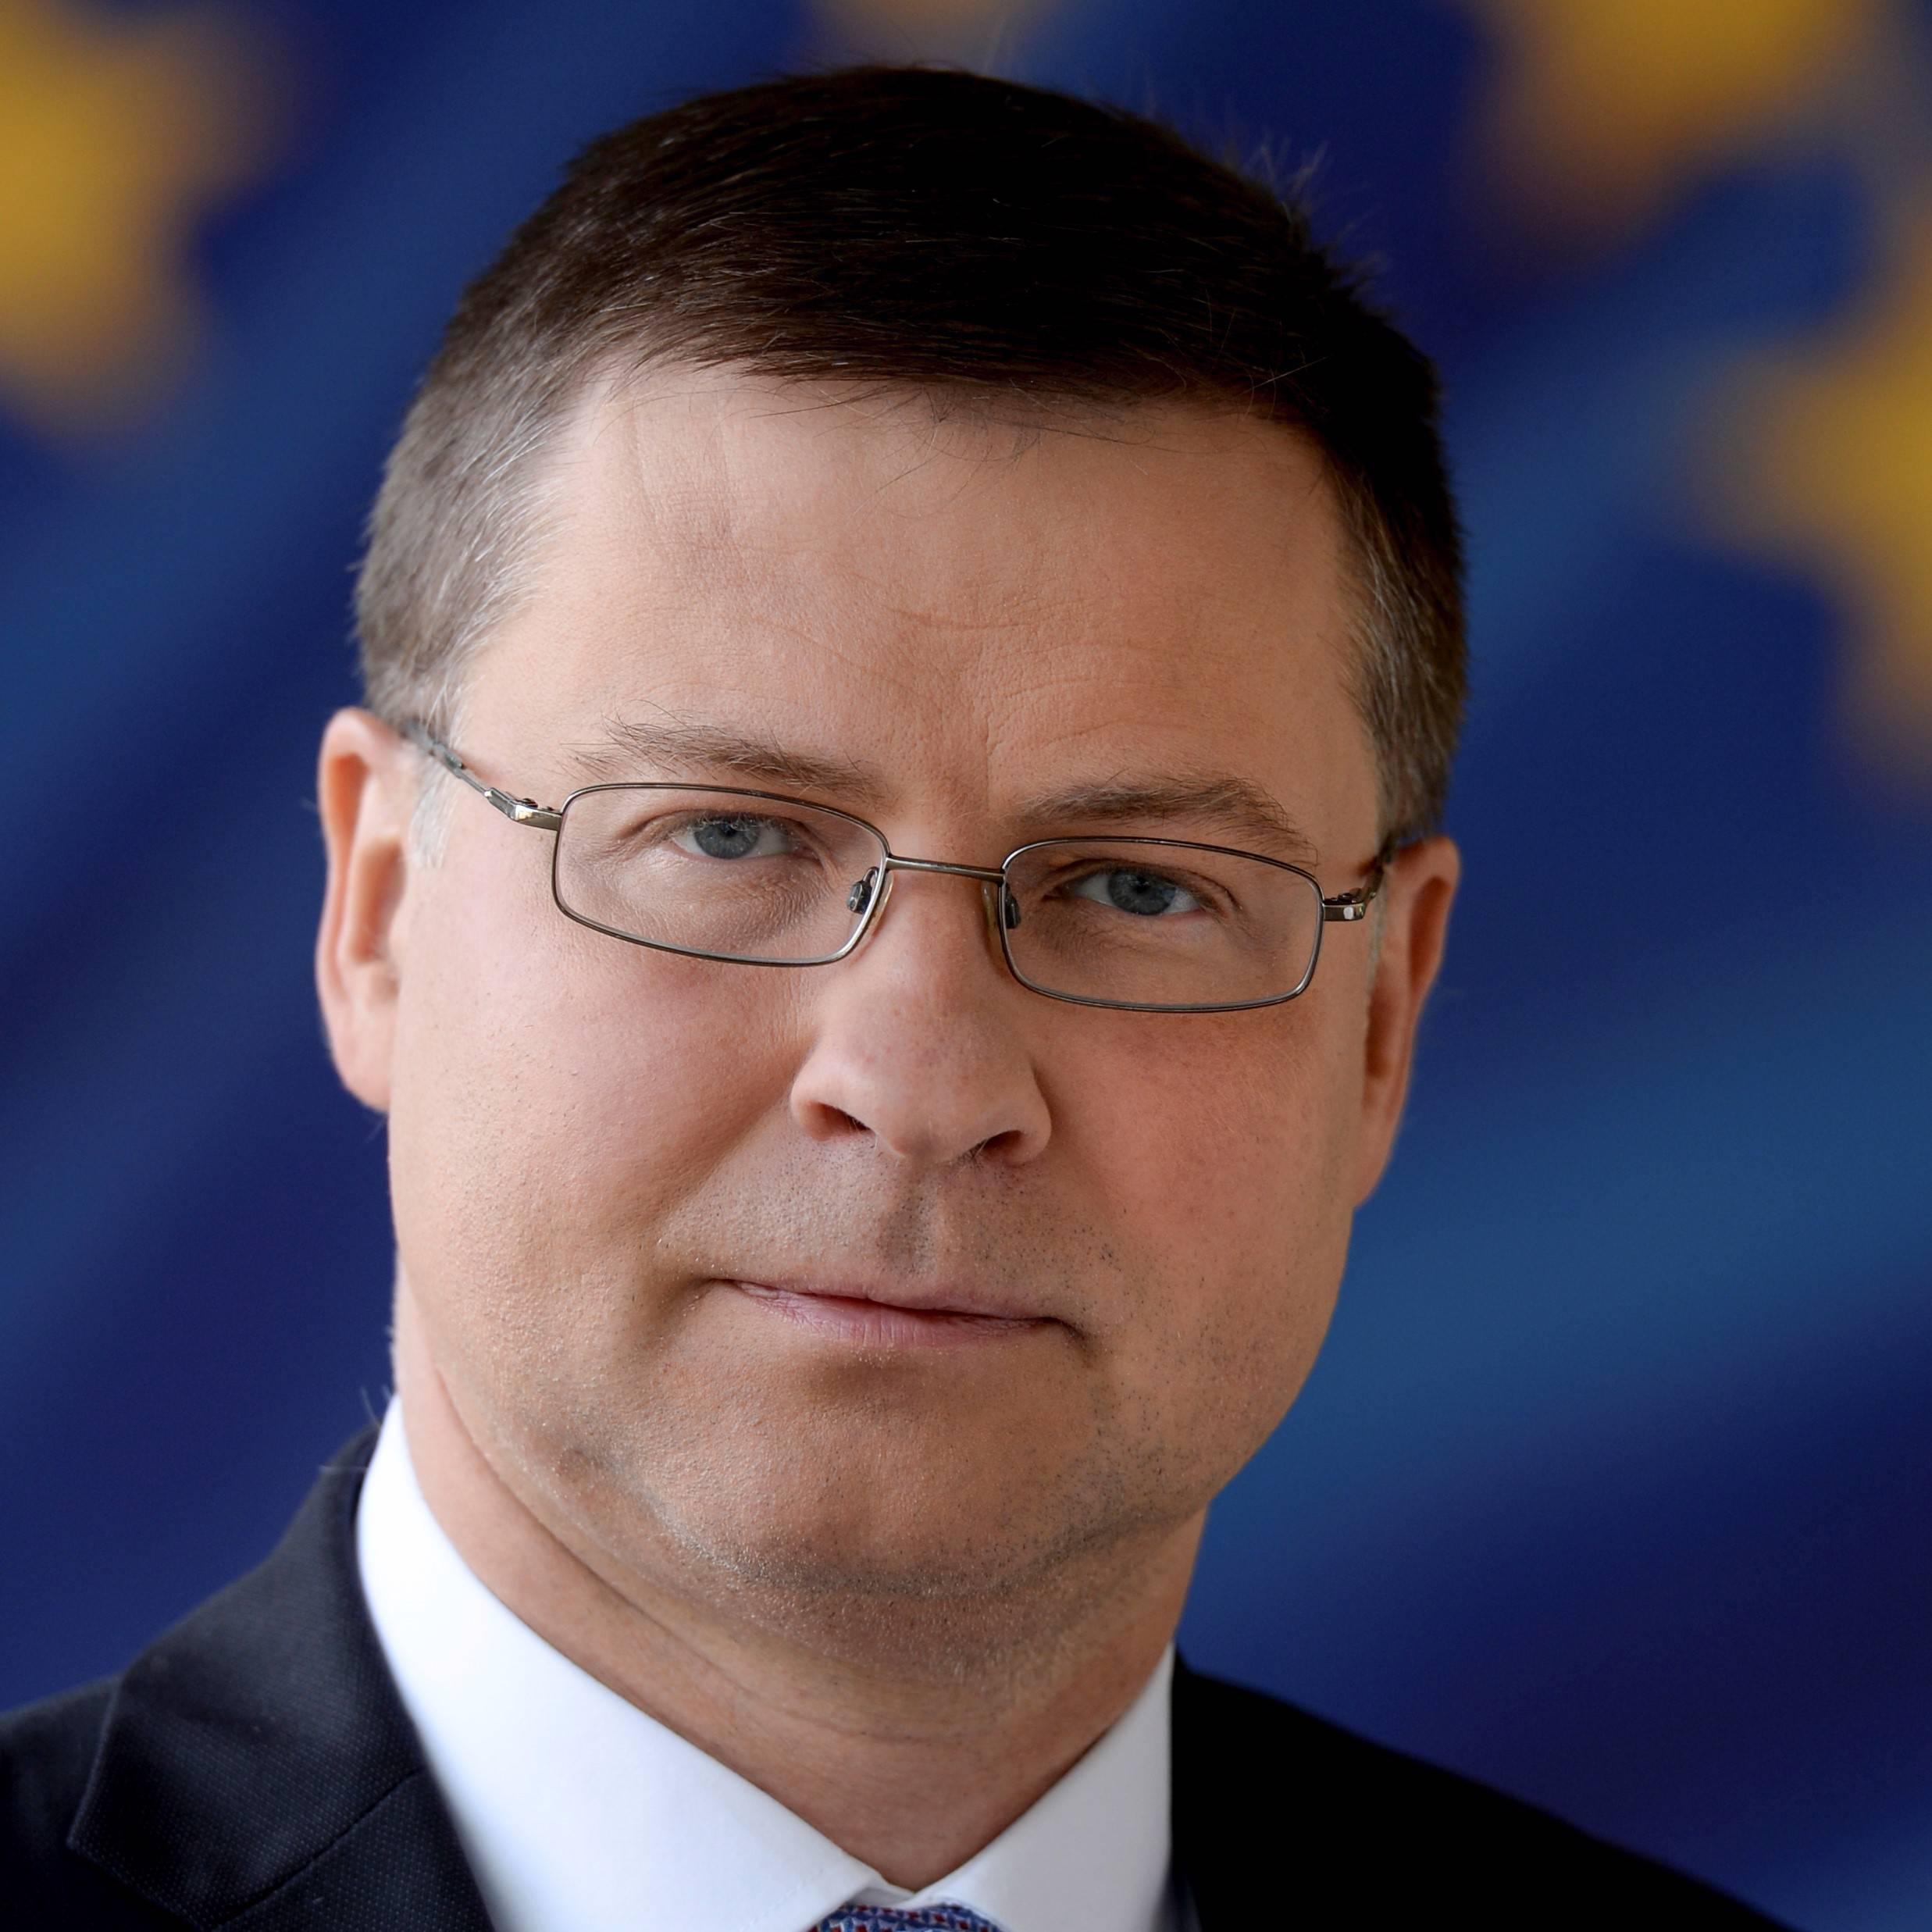 Photo of Valdis Dombrovskis